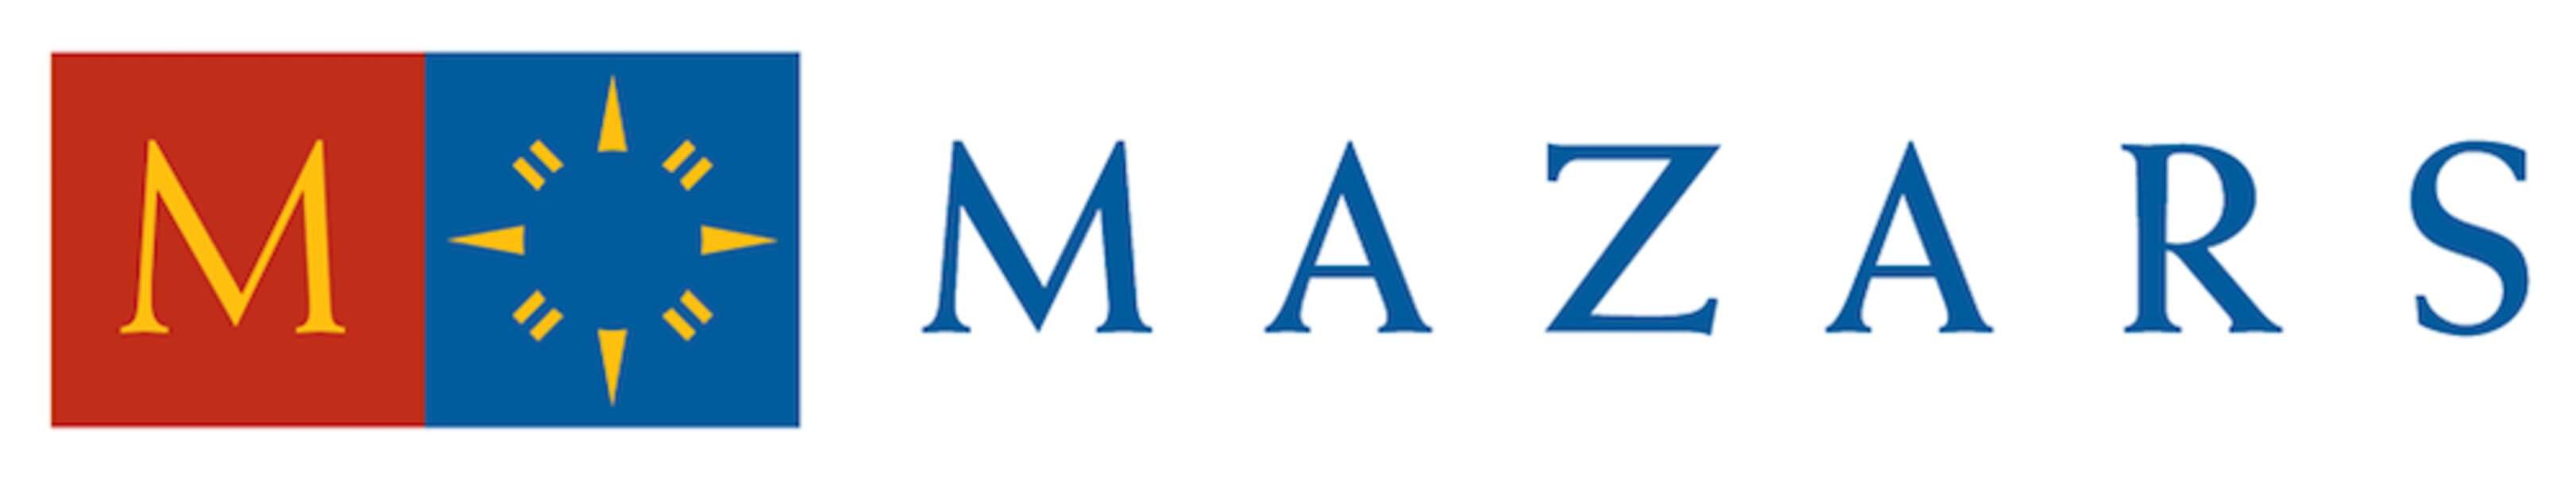 Mazars (audit) : 1.100 recrutements prévus en 2018